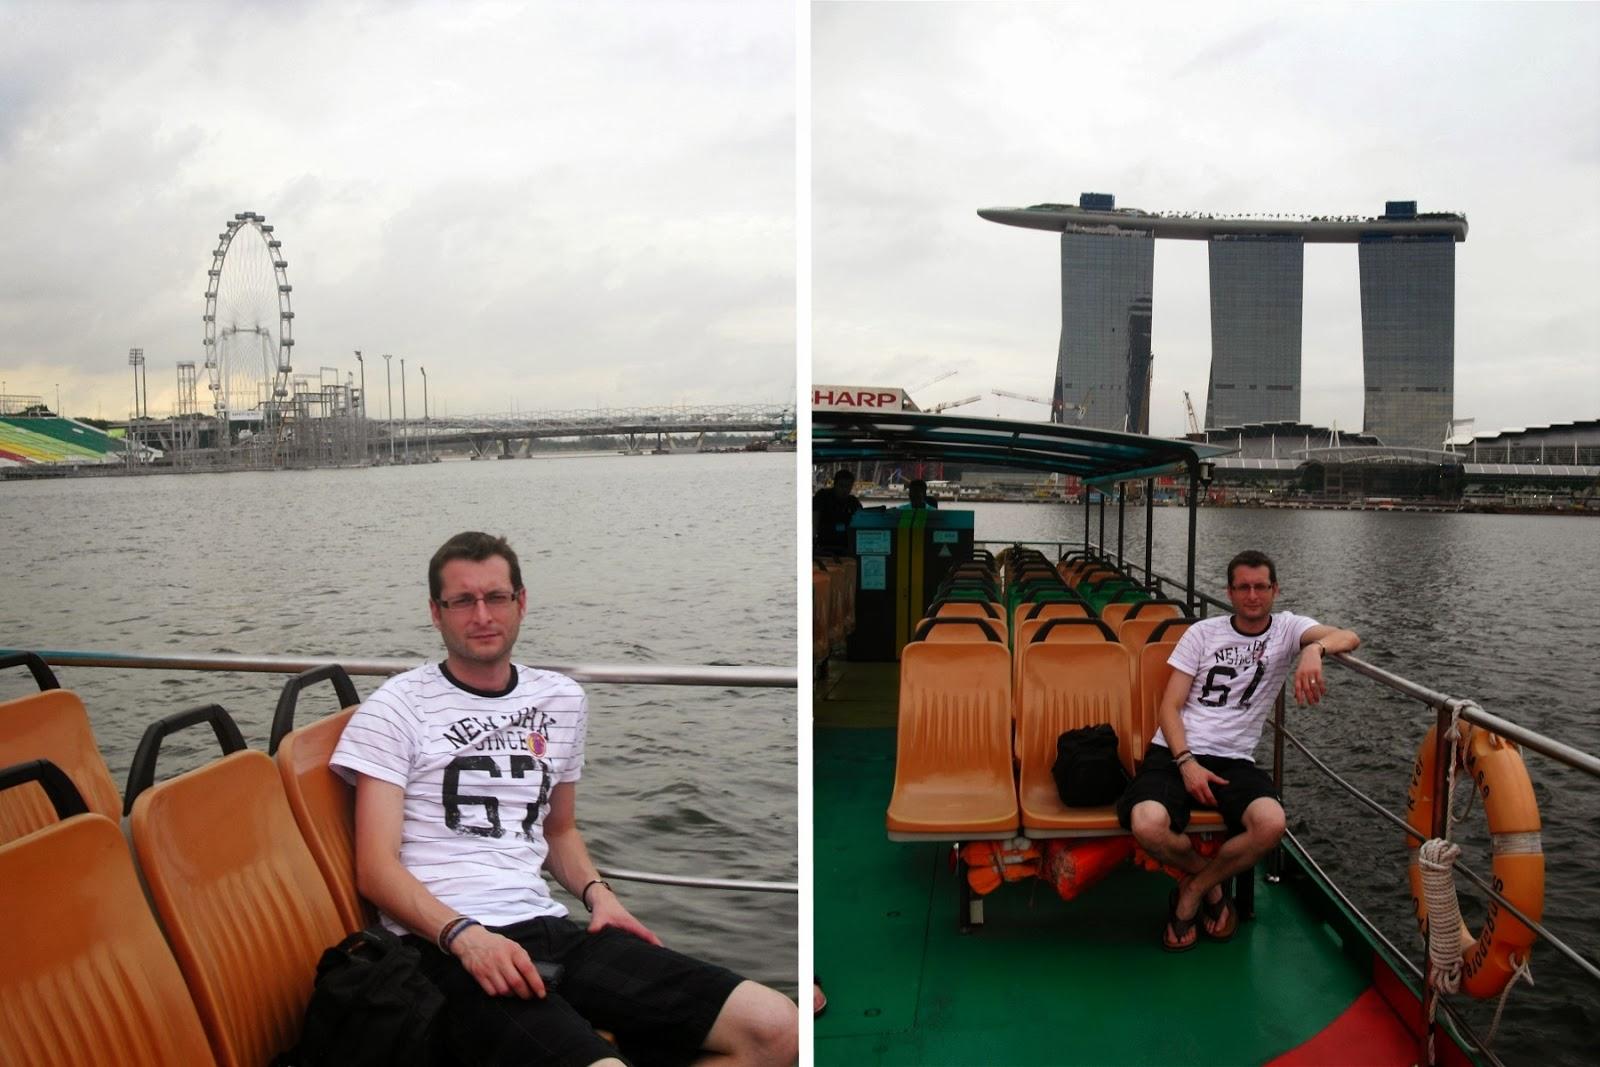 singapur, singapore noria crucero bahia